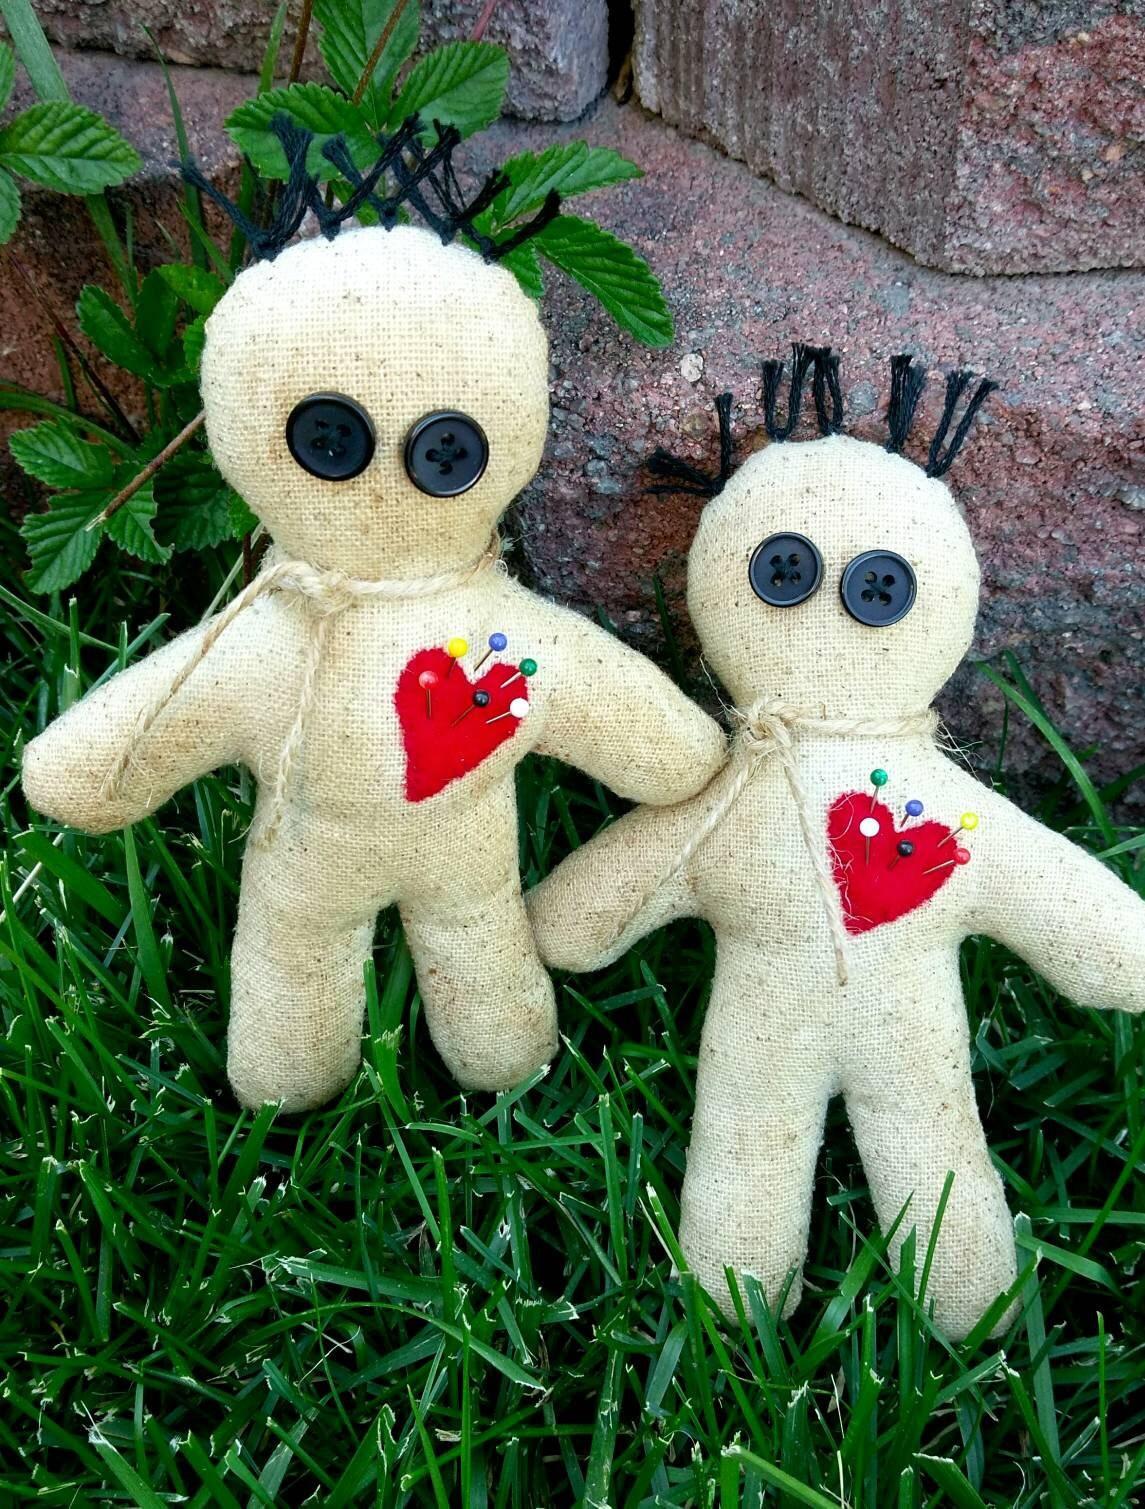 Handmade Voodoo Doll/Poppet for Ritual, Meditation, Healing